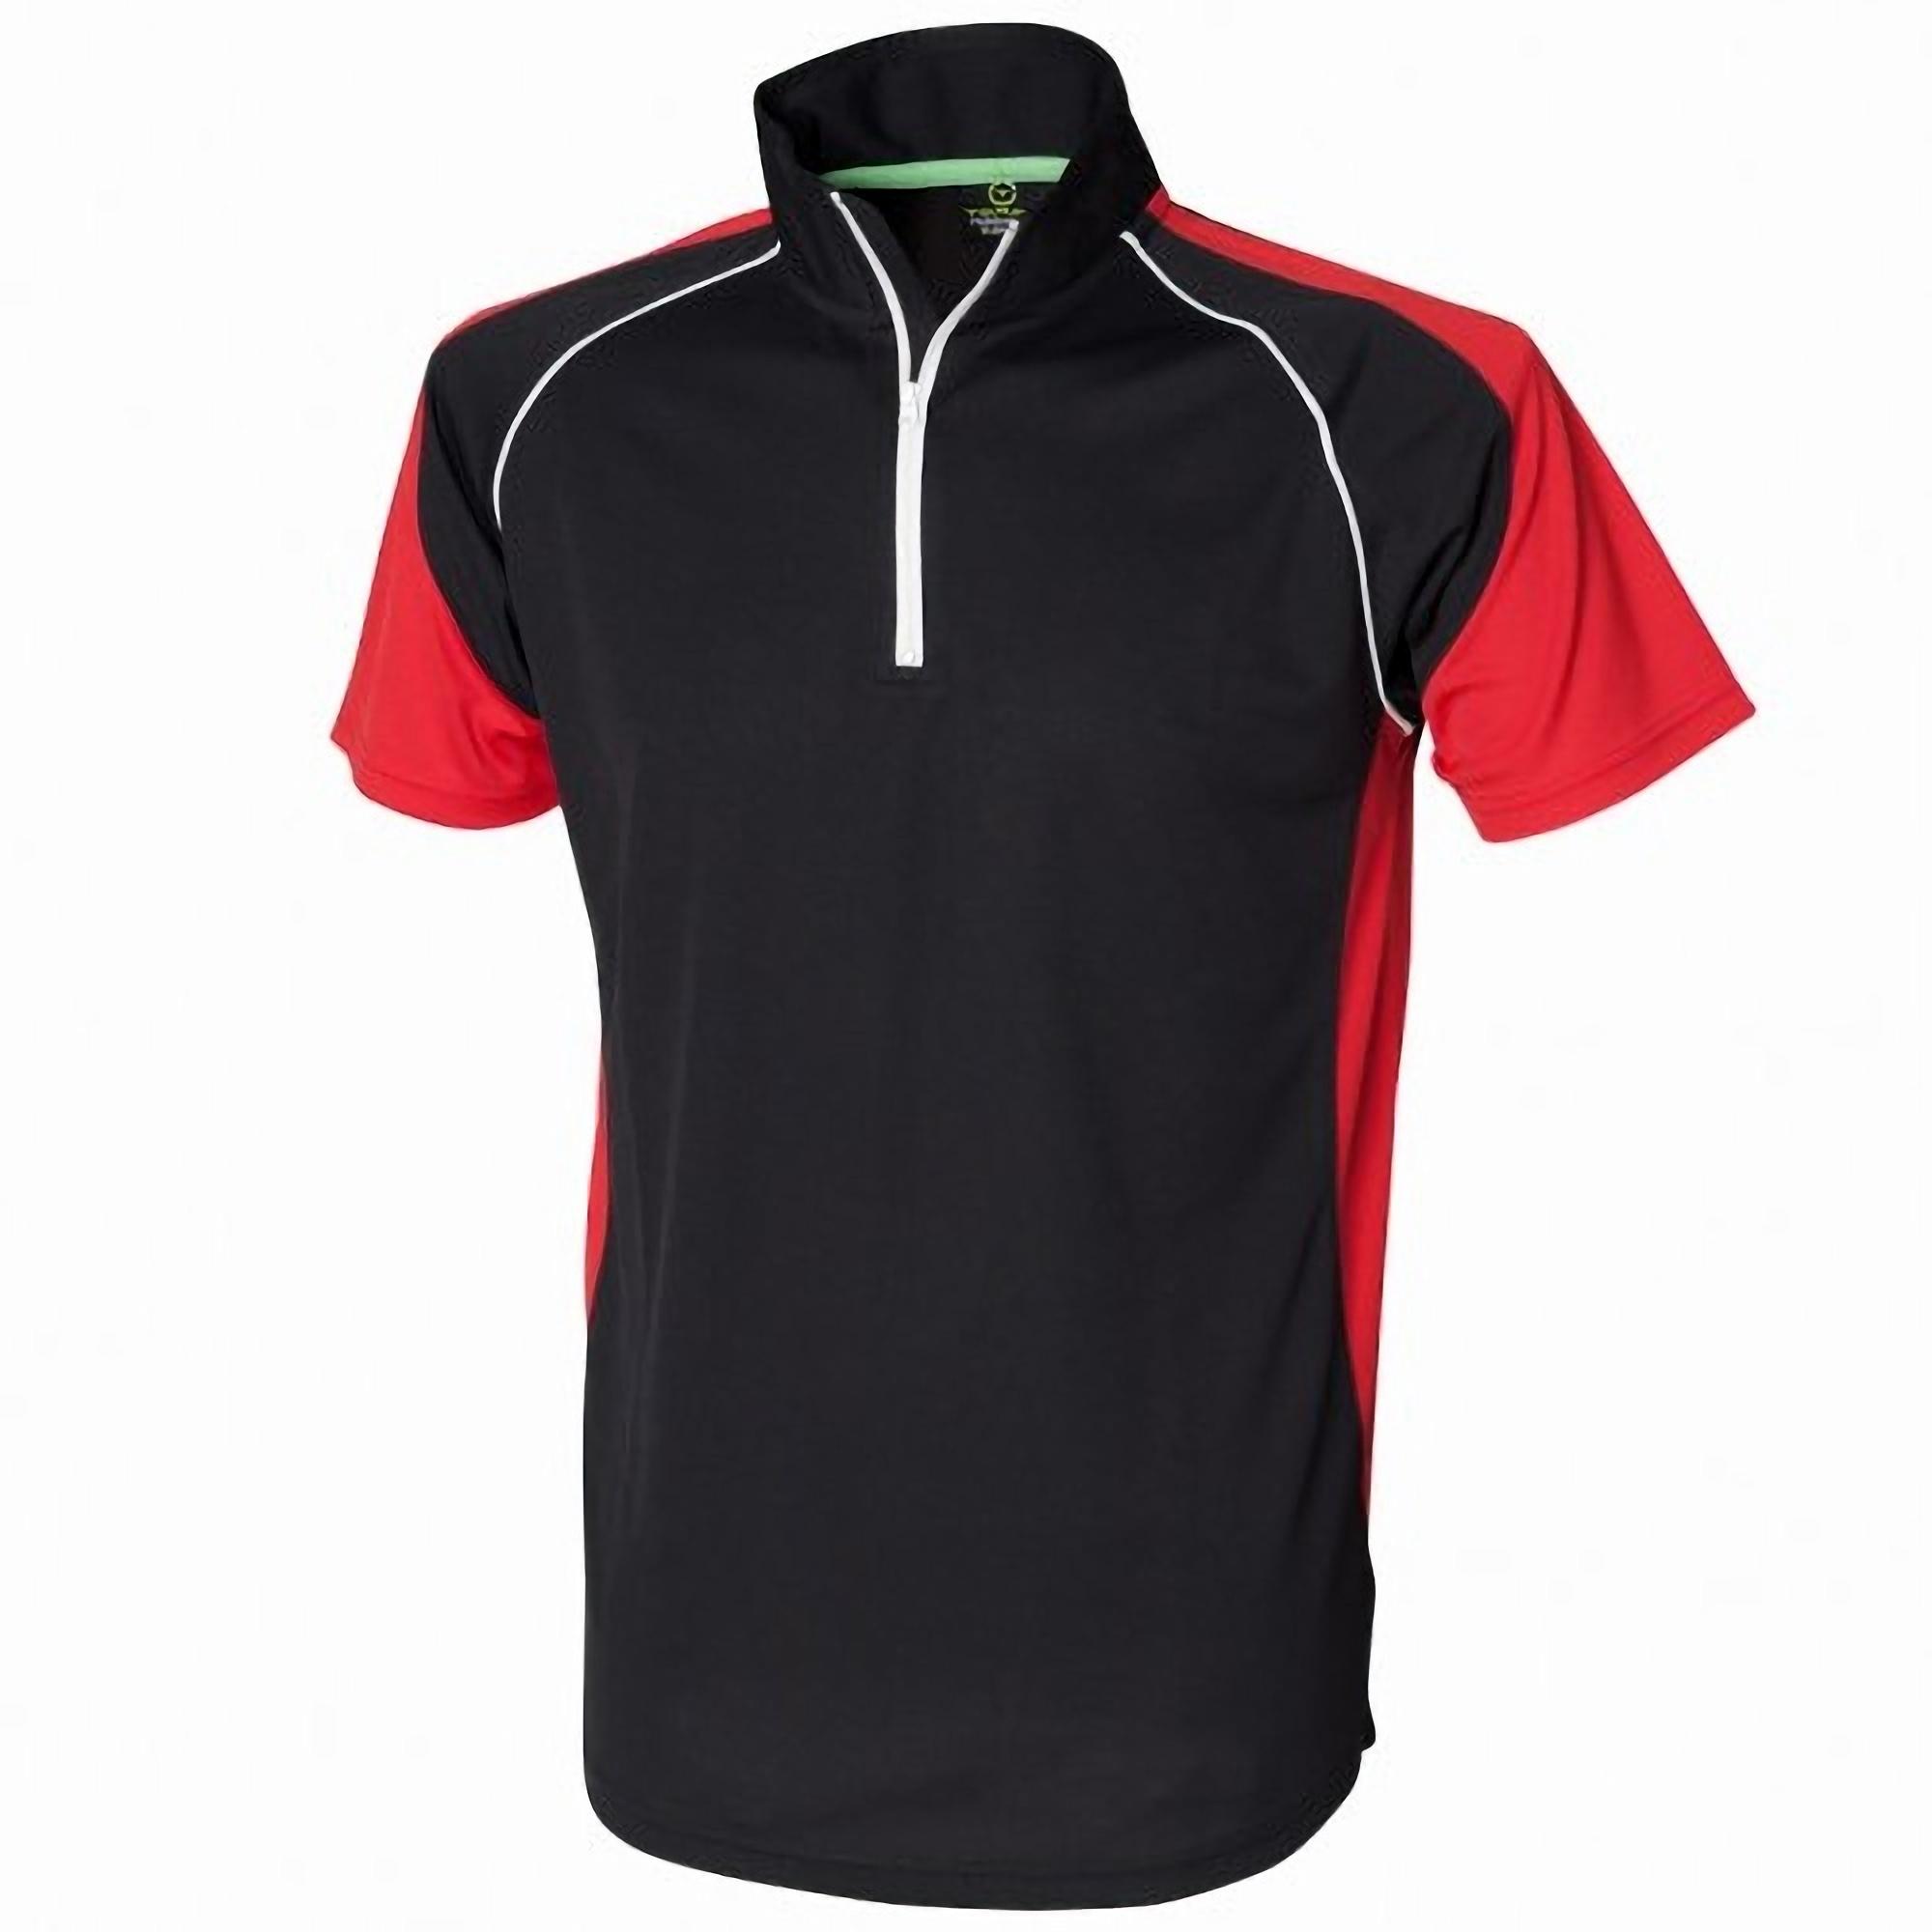 Tombo teamsport mens panel zip neck sports short sleeve for Mens sport t shirts